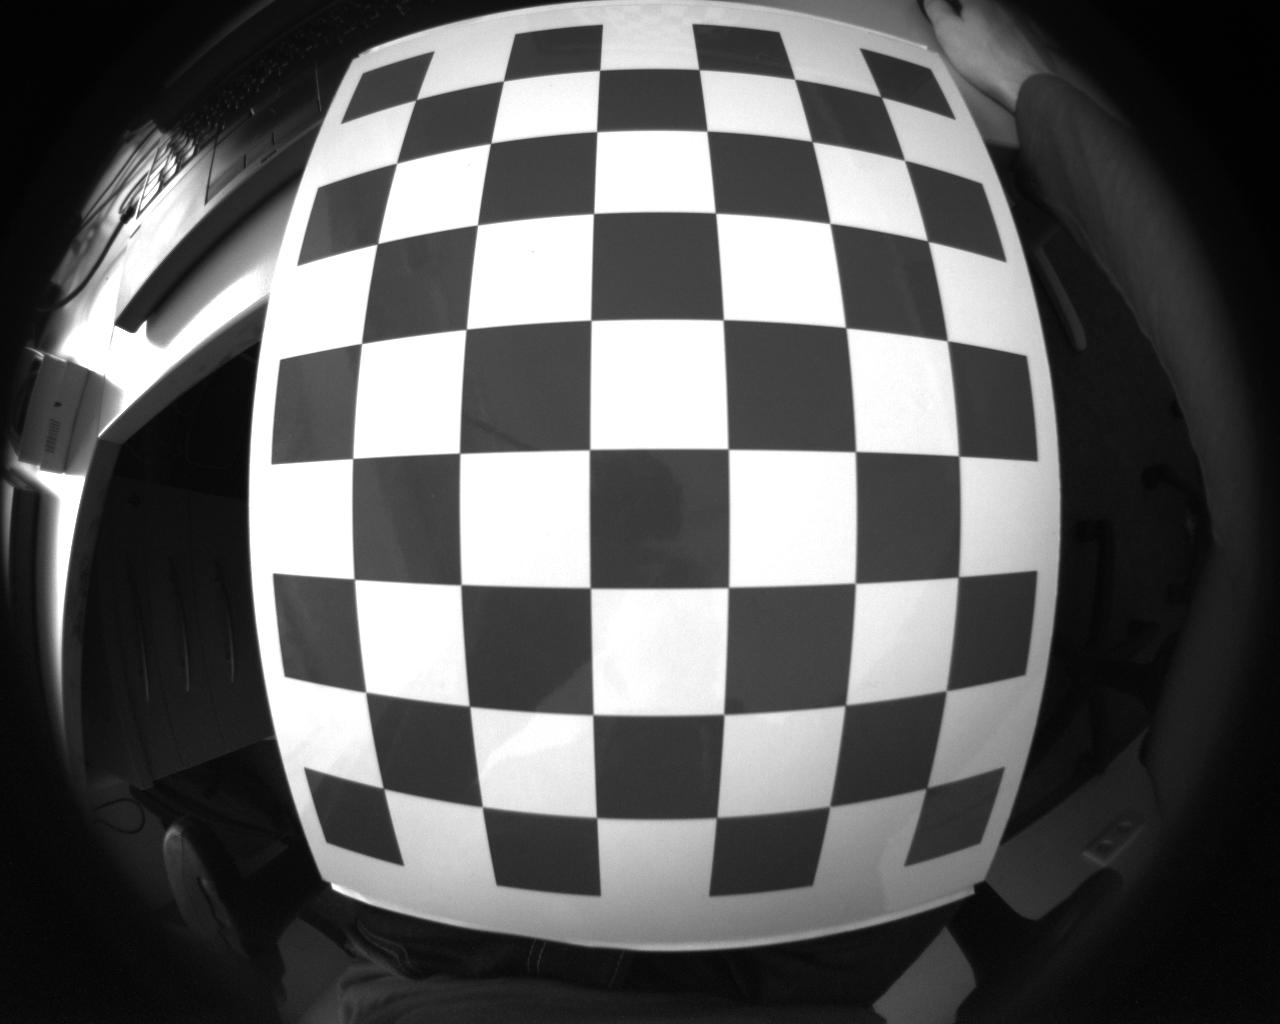 Chessboard detection fails on fisheye image - OpenCV Q&A Forum